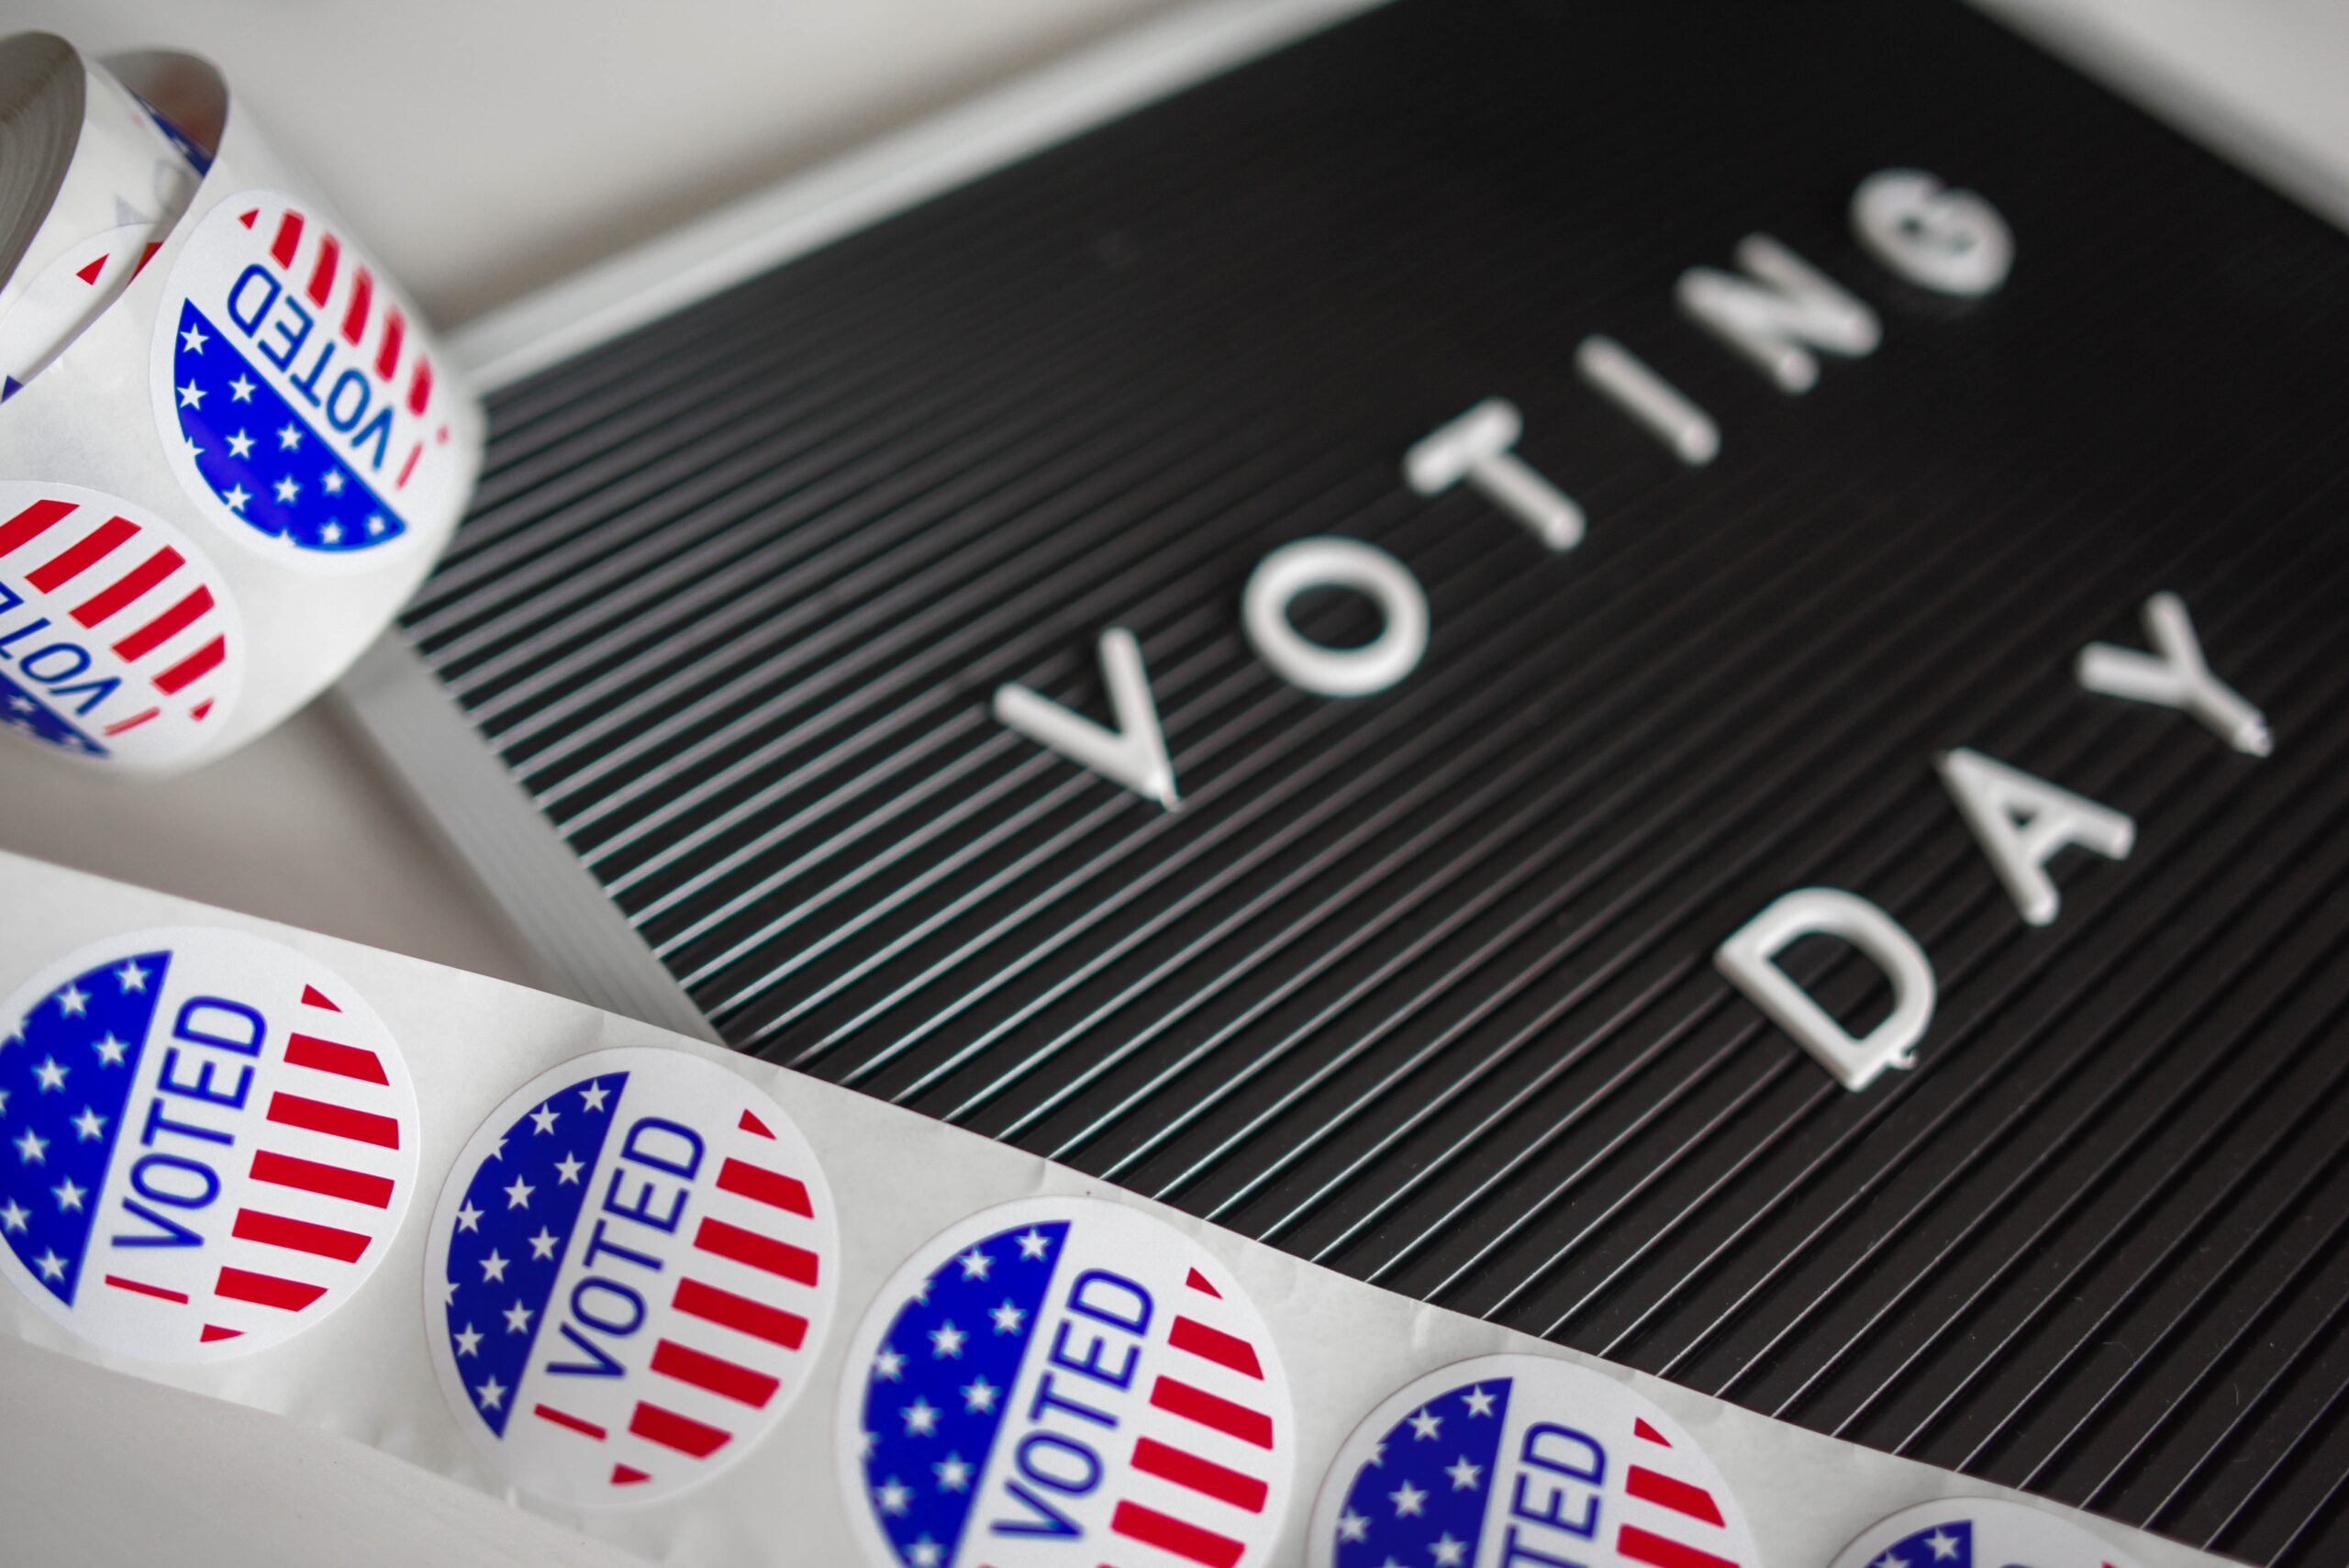 i-voted-sticker-lot-1550340